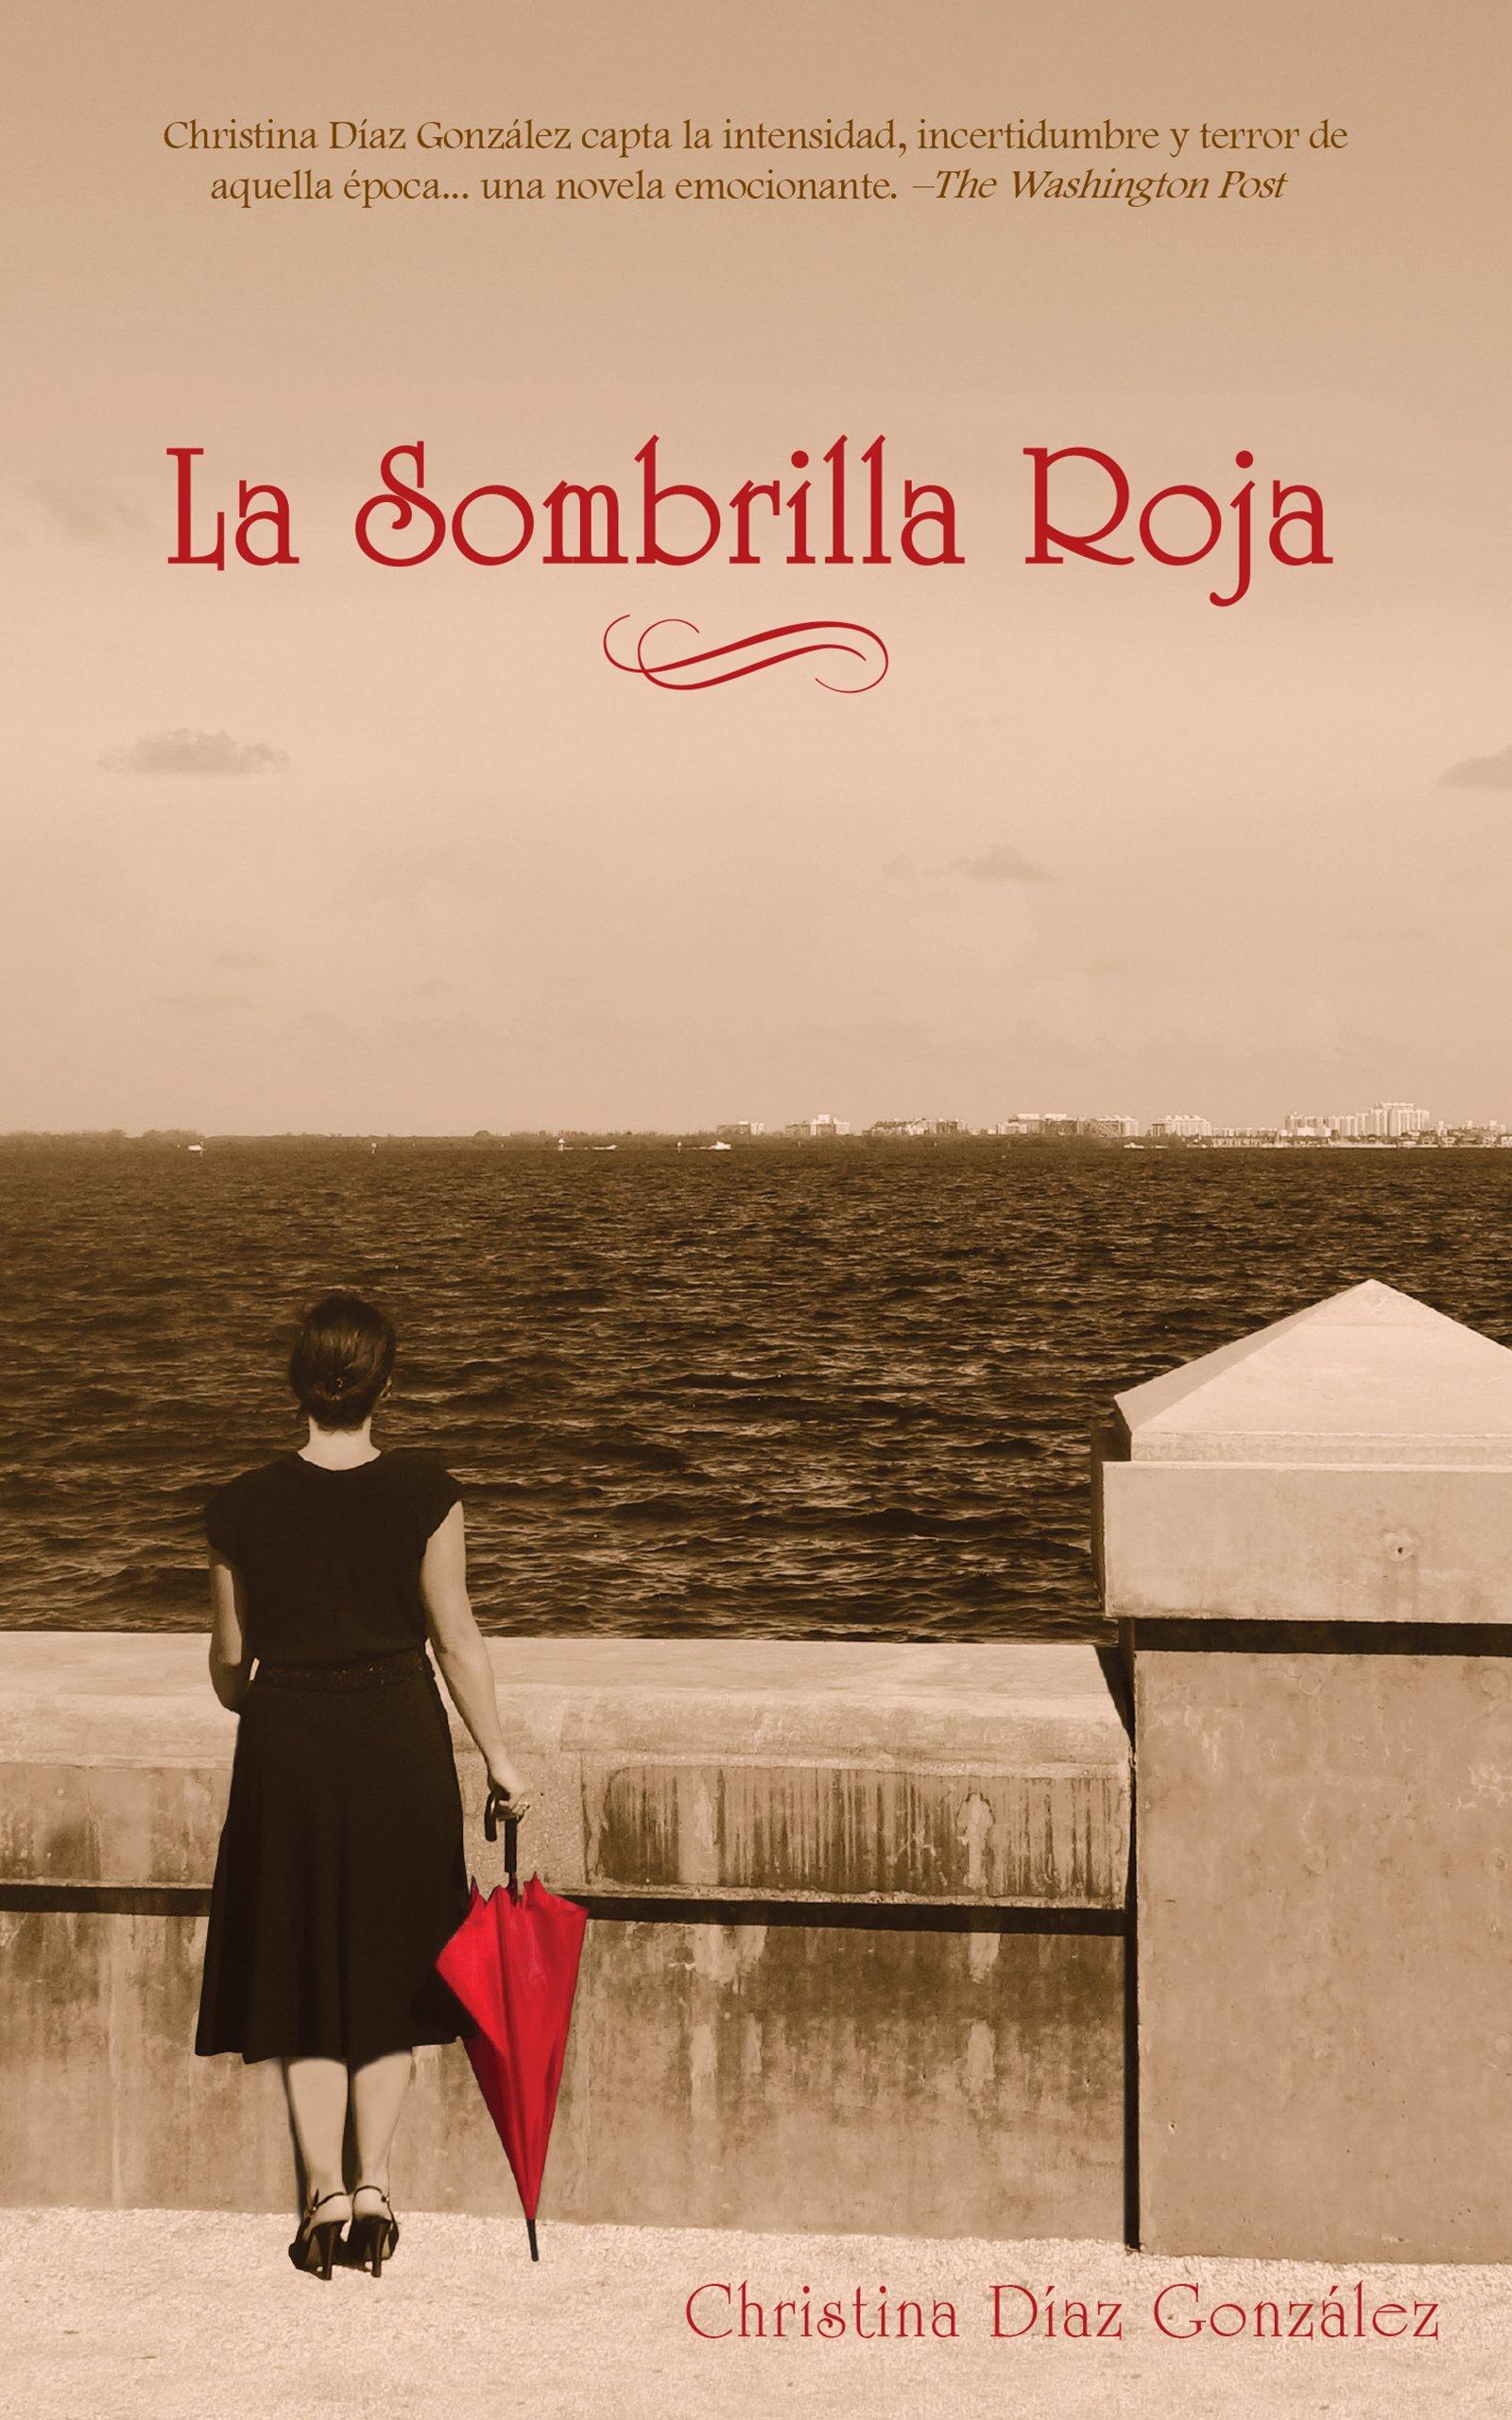 La Sombrilla Roja